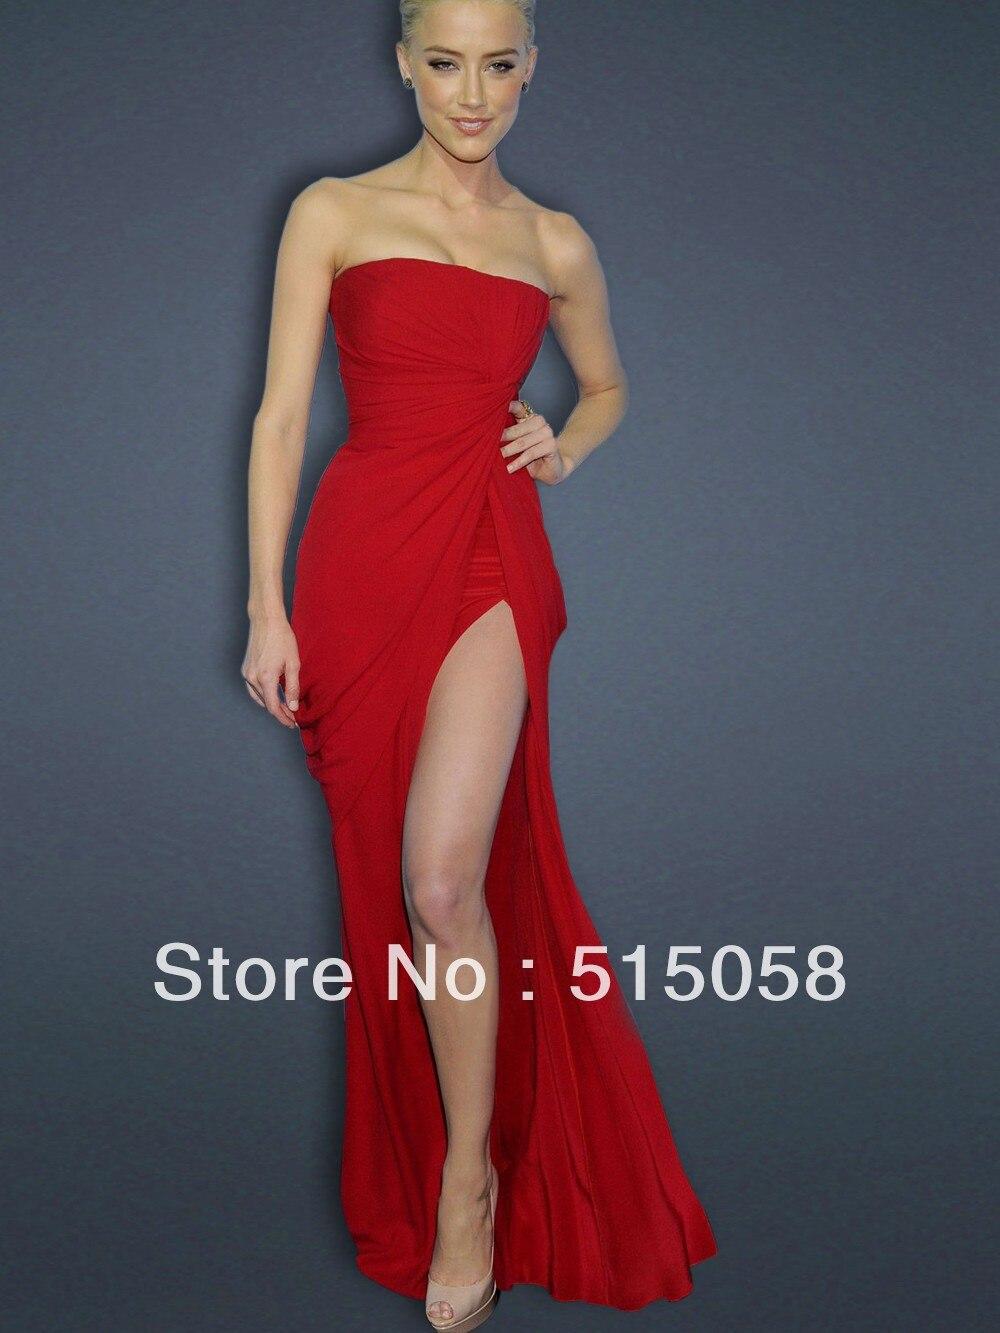 Cheap Chiffon Long High Slit Celebrity Dresses Red Carpet Gowns 2014 ...